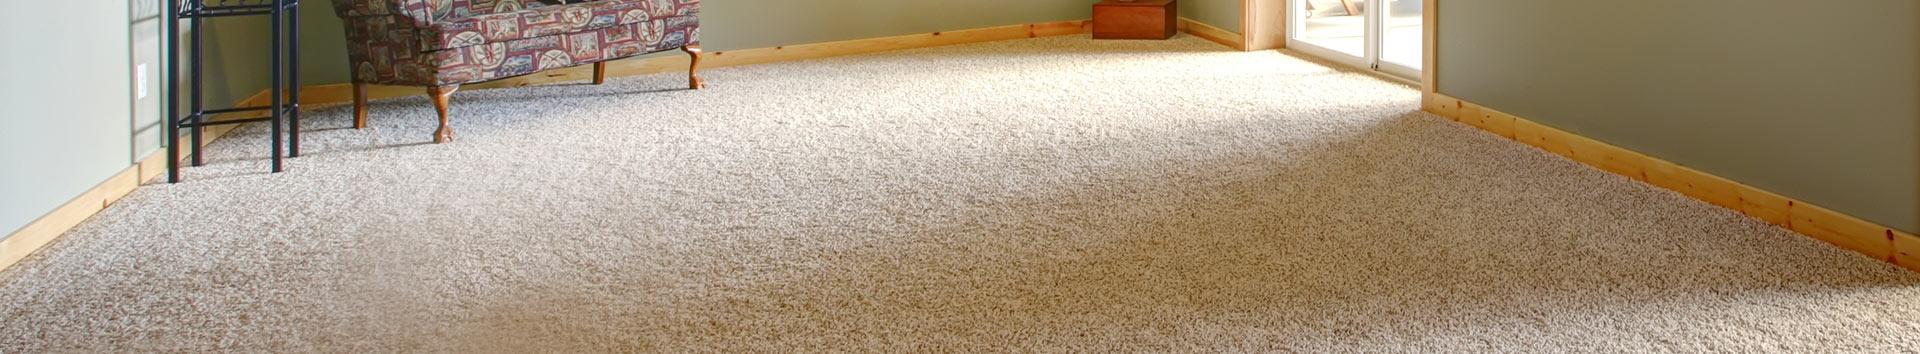 Carpet Cleaning Albuquerque Nm Bear Carpet Inc Der